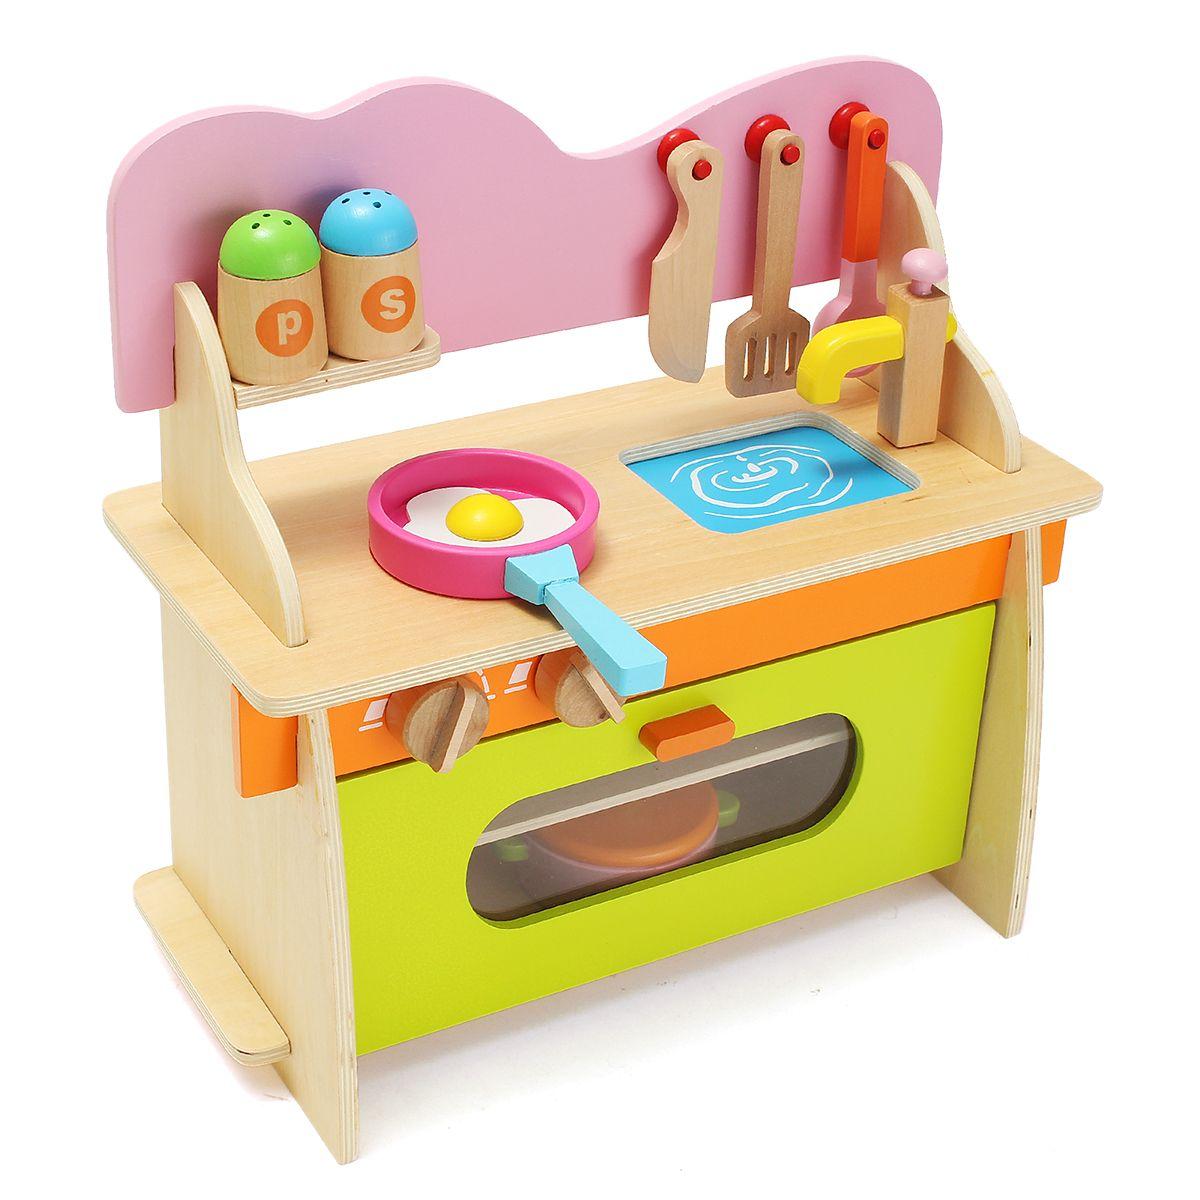 Wholesale Price Free Shipping Developmental Toys 36 17 36cm Colorful Kitchen Wooden Wood Pretend Gas Stove Toy Mod Wooden Baby Toys Toy Kitchen Kids Kitchen